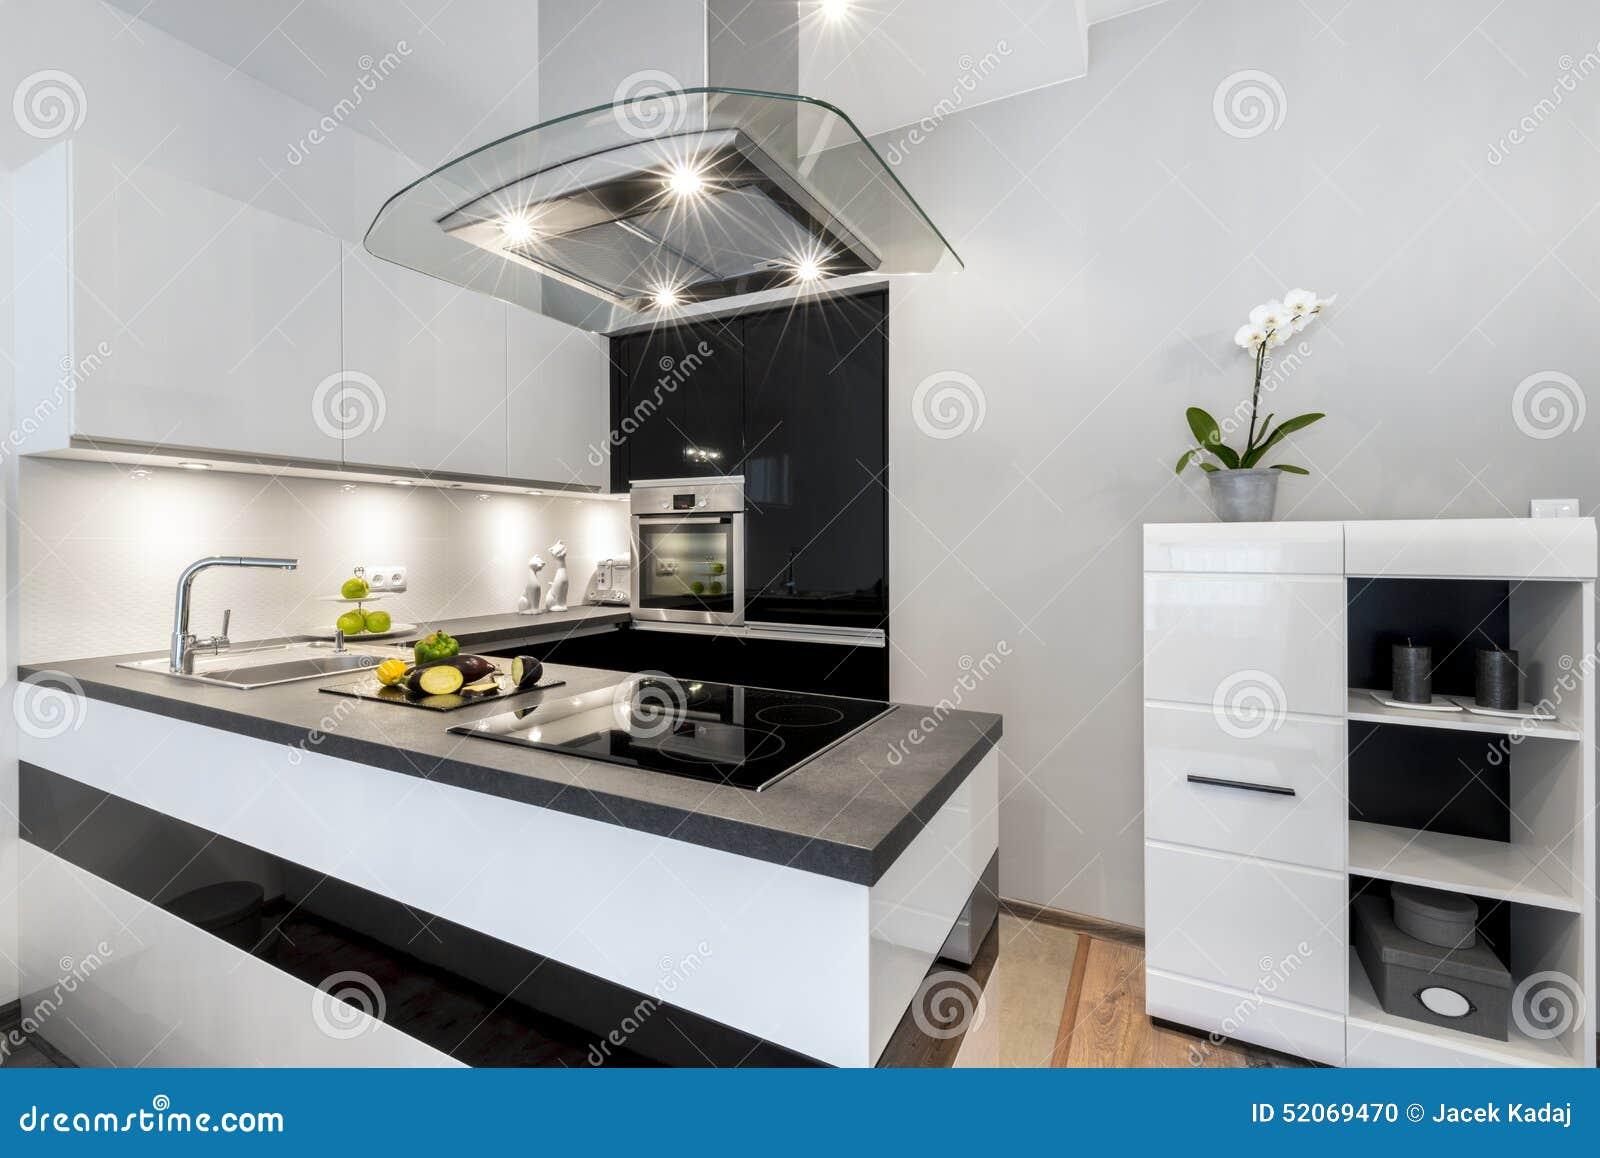 Keuken Ontwerpen Ikea : Modern Kitchen Interior Design